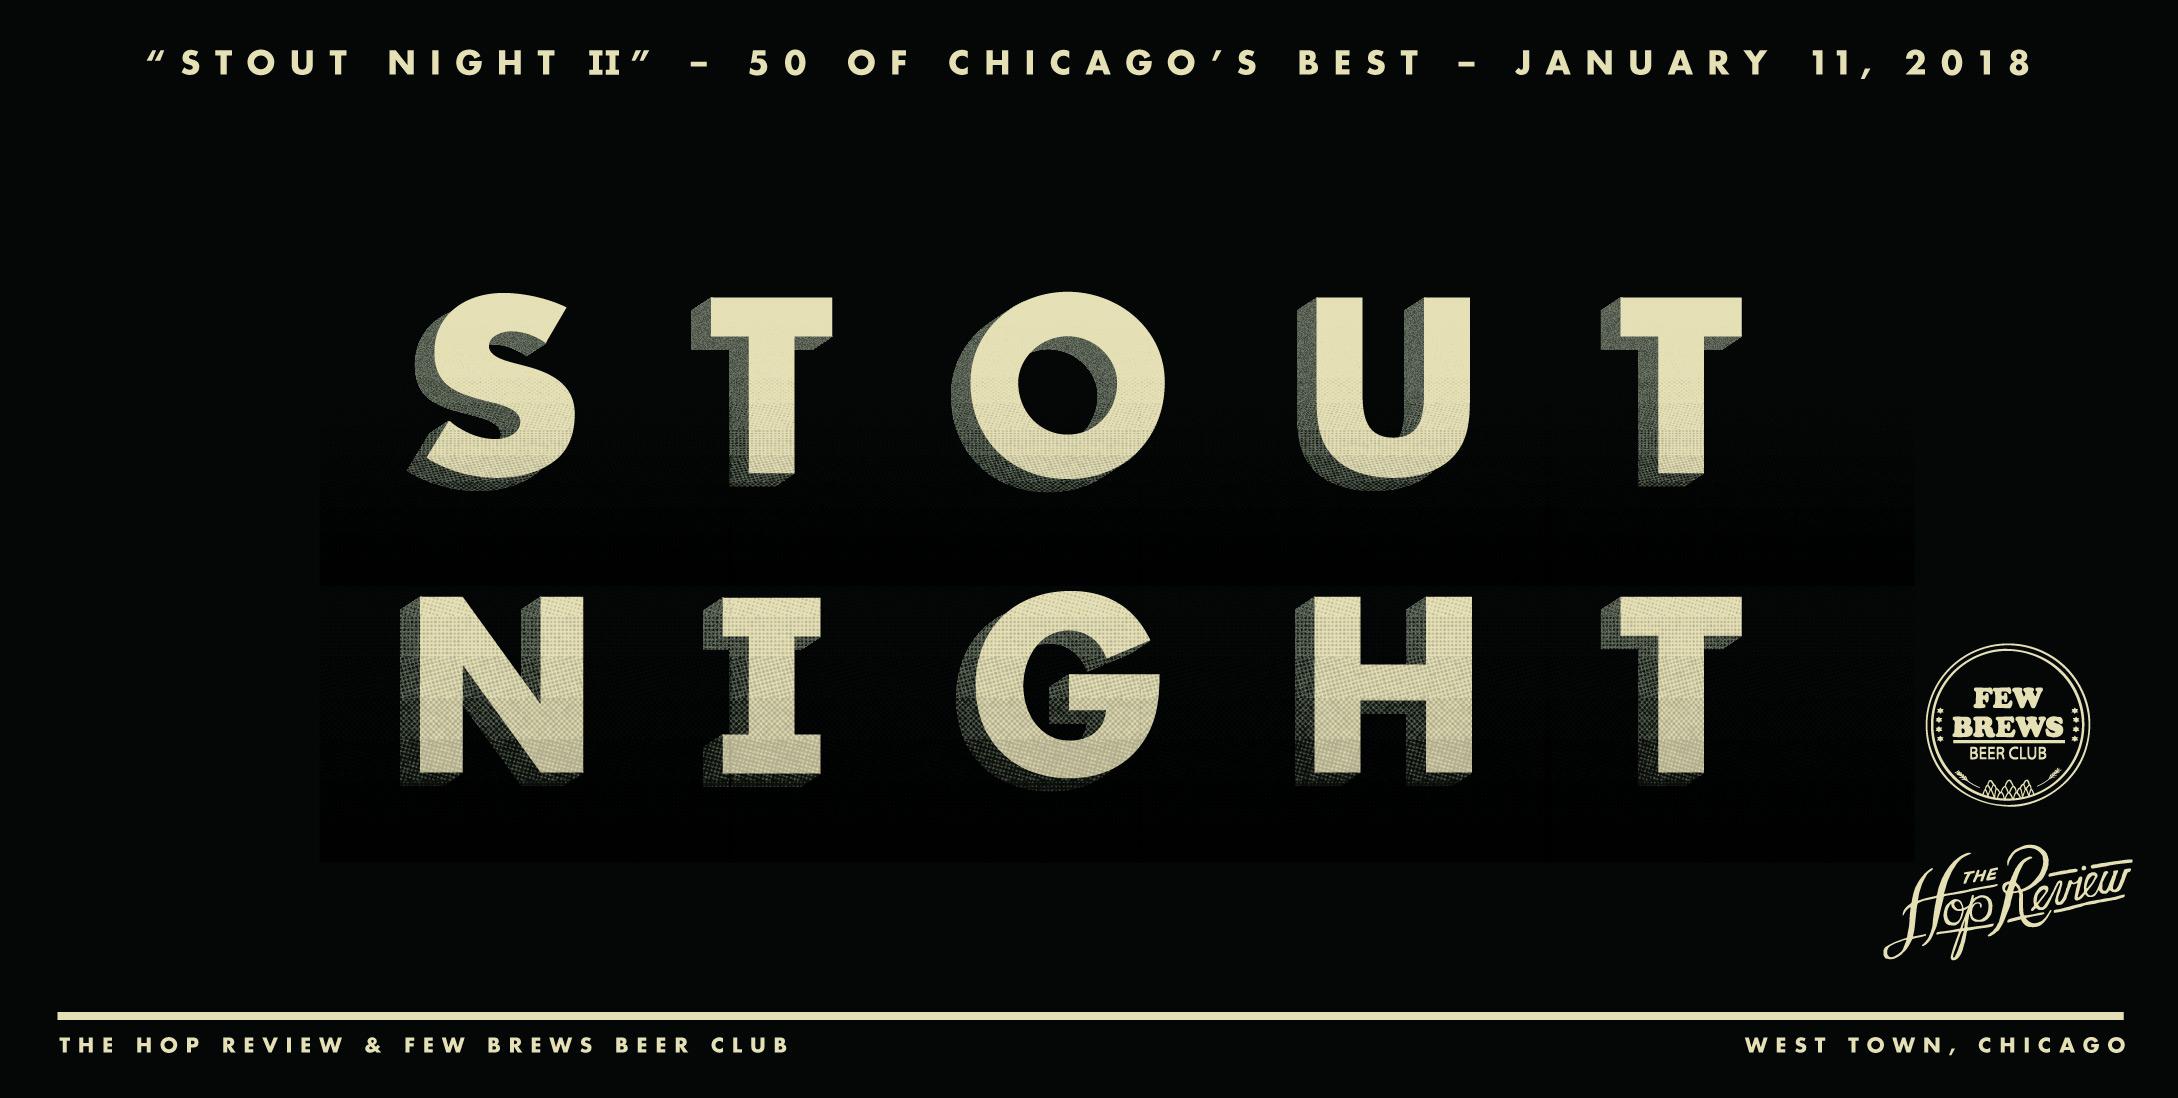 StoutNight-2018-HeaderGraphic-3.jpg